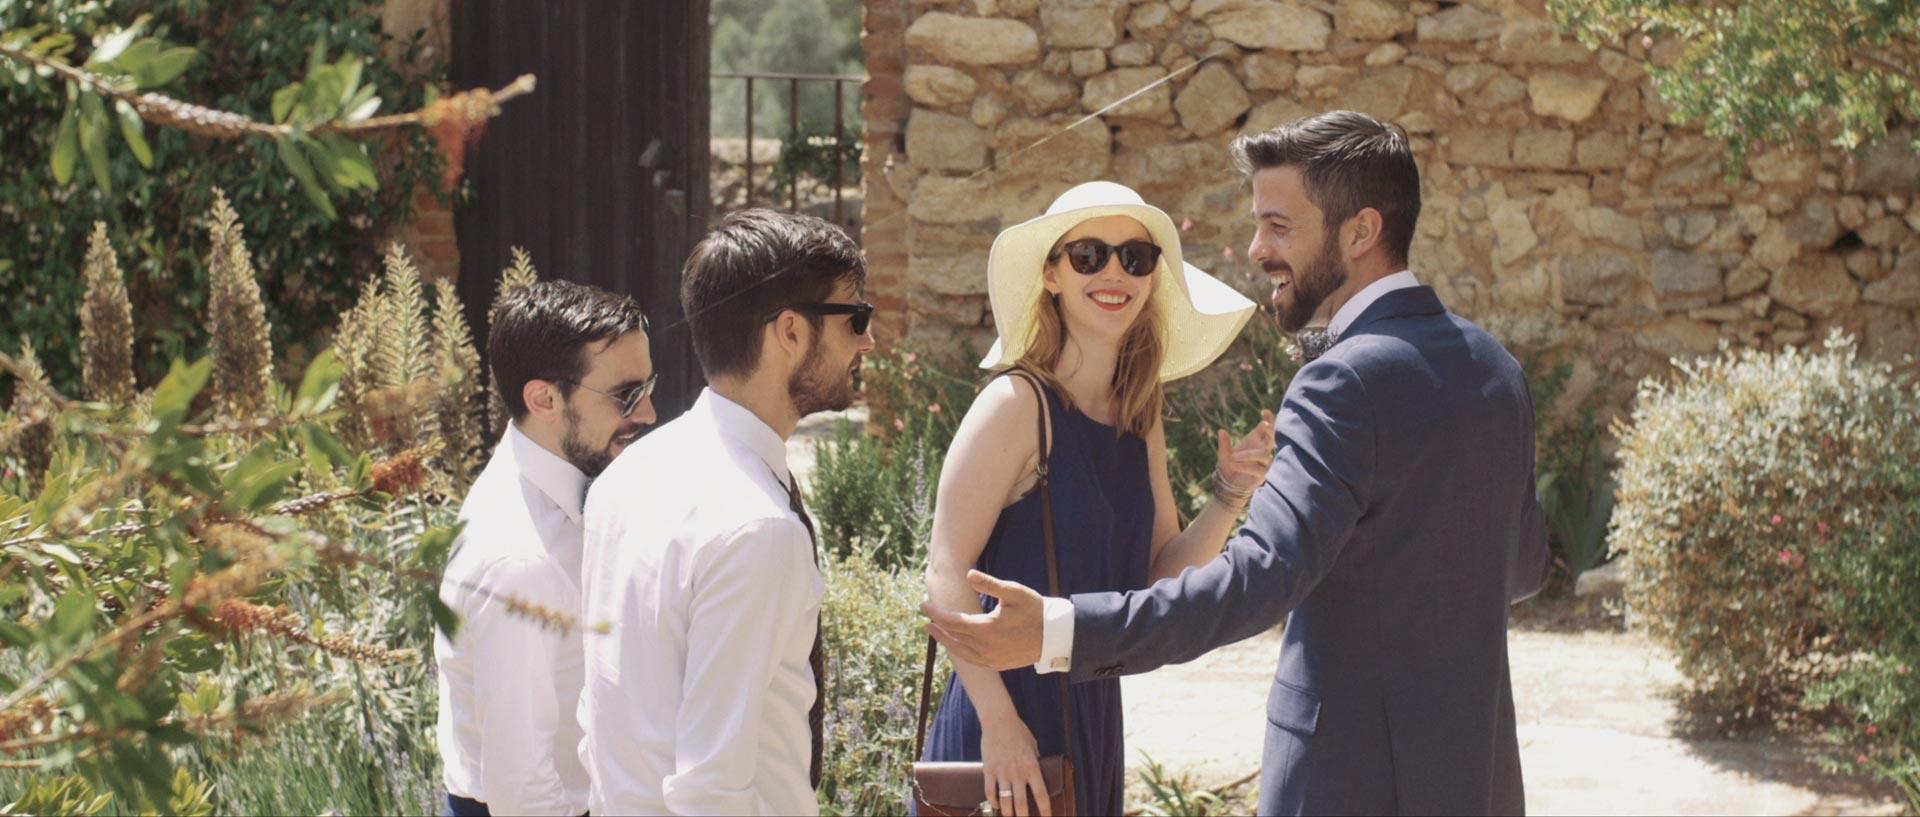 destination wedding cinematography case Felix sitges barcelona Spain